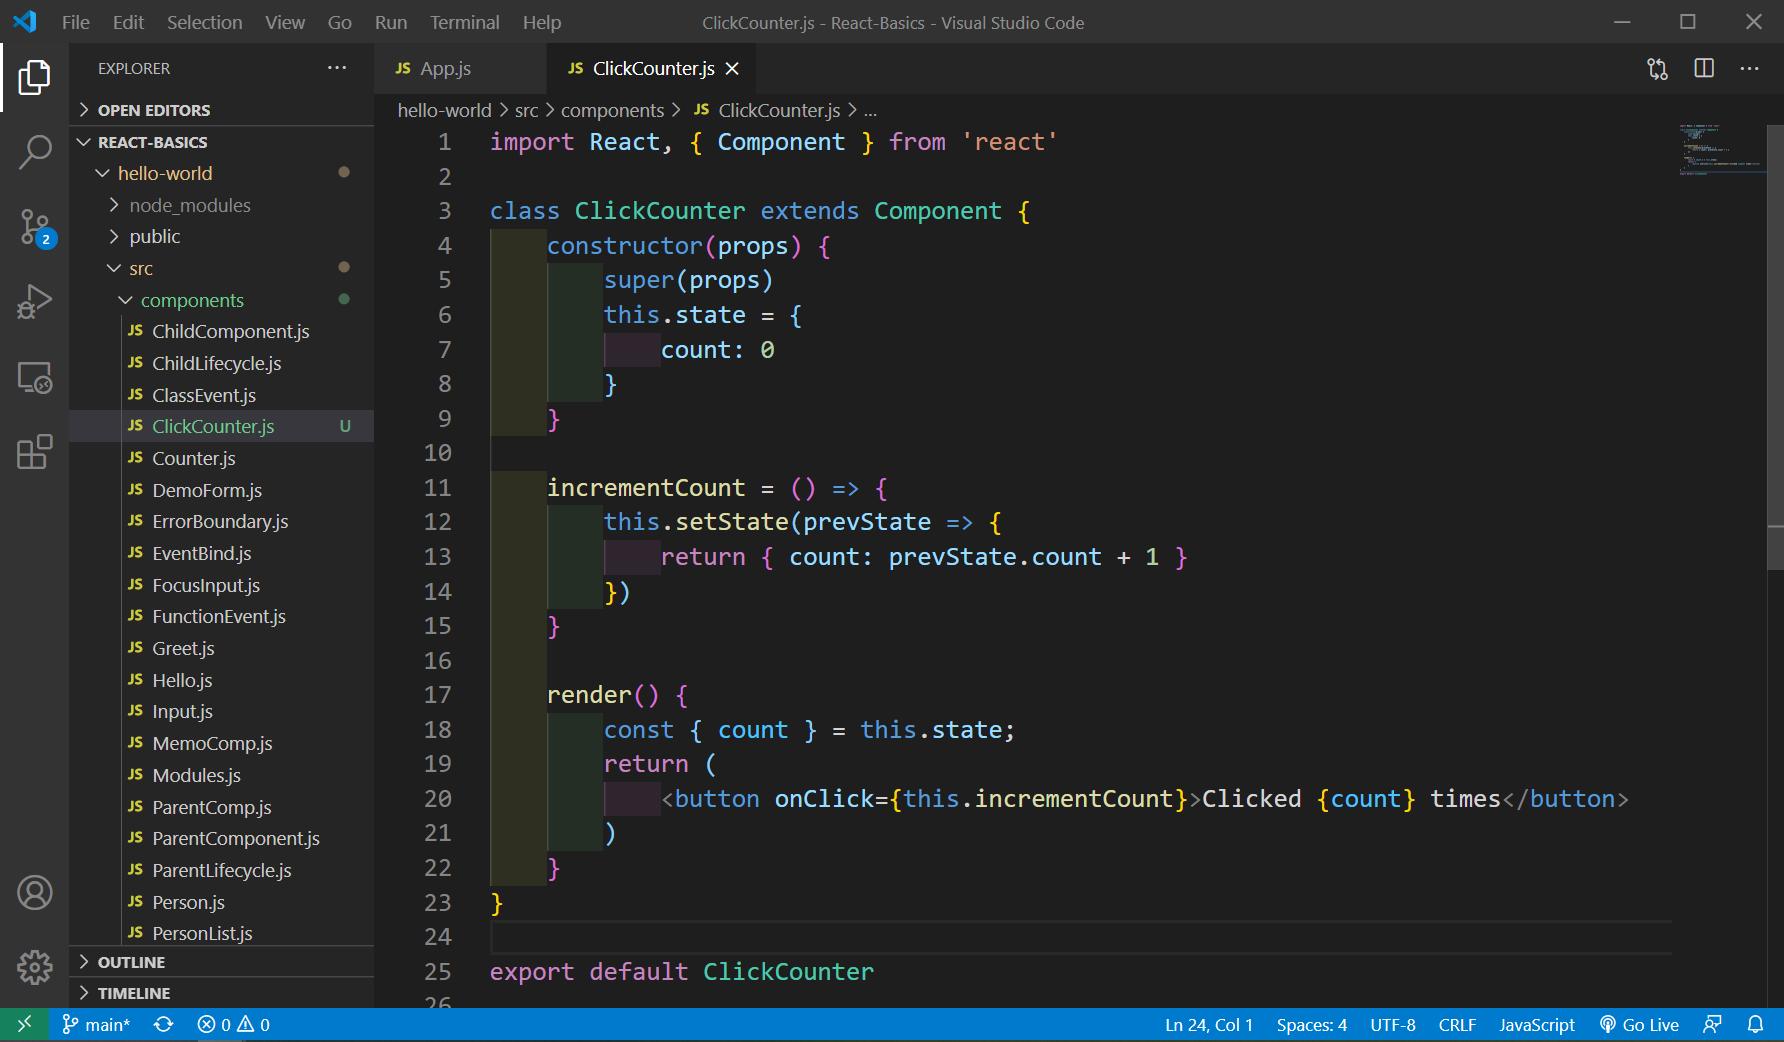 ClickCounter.js